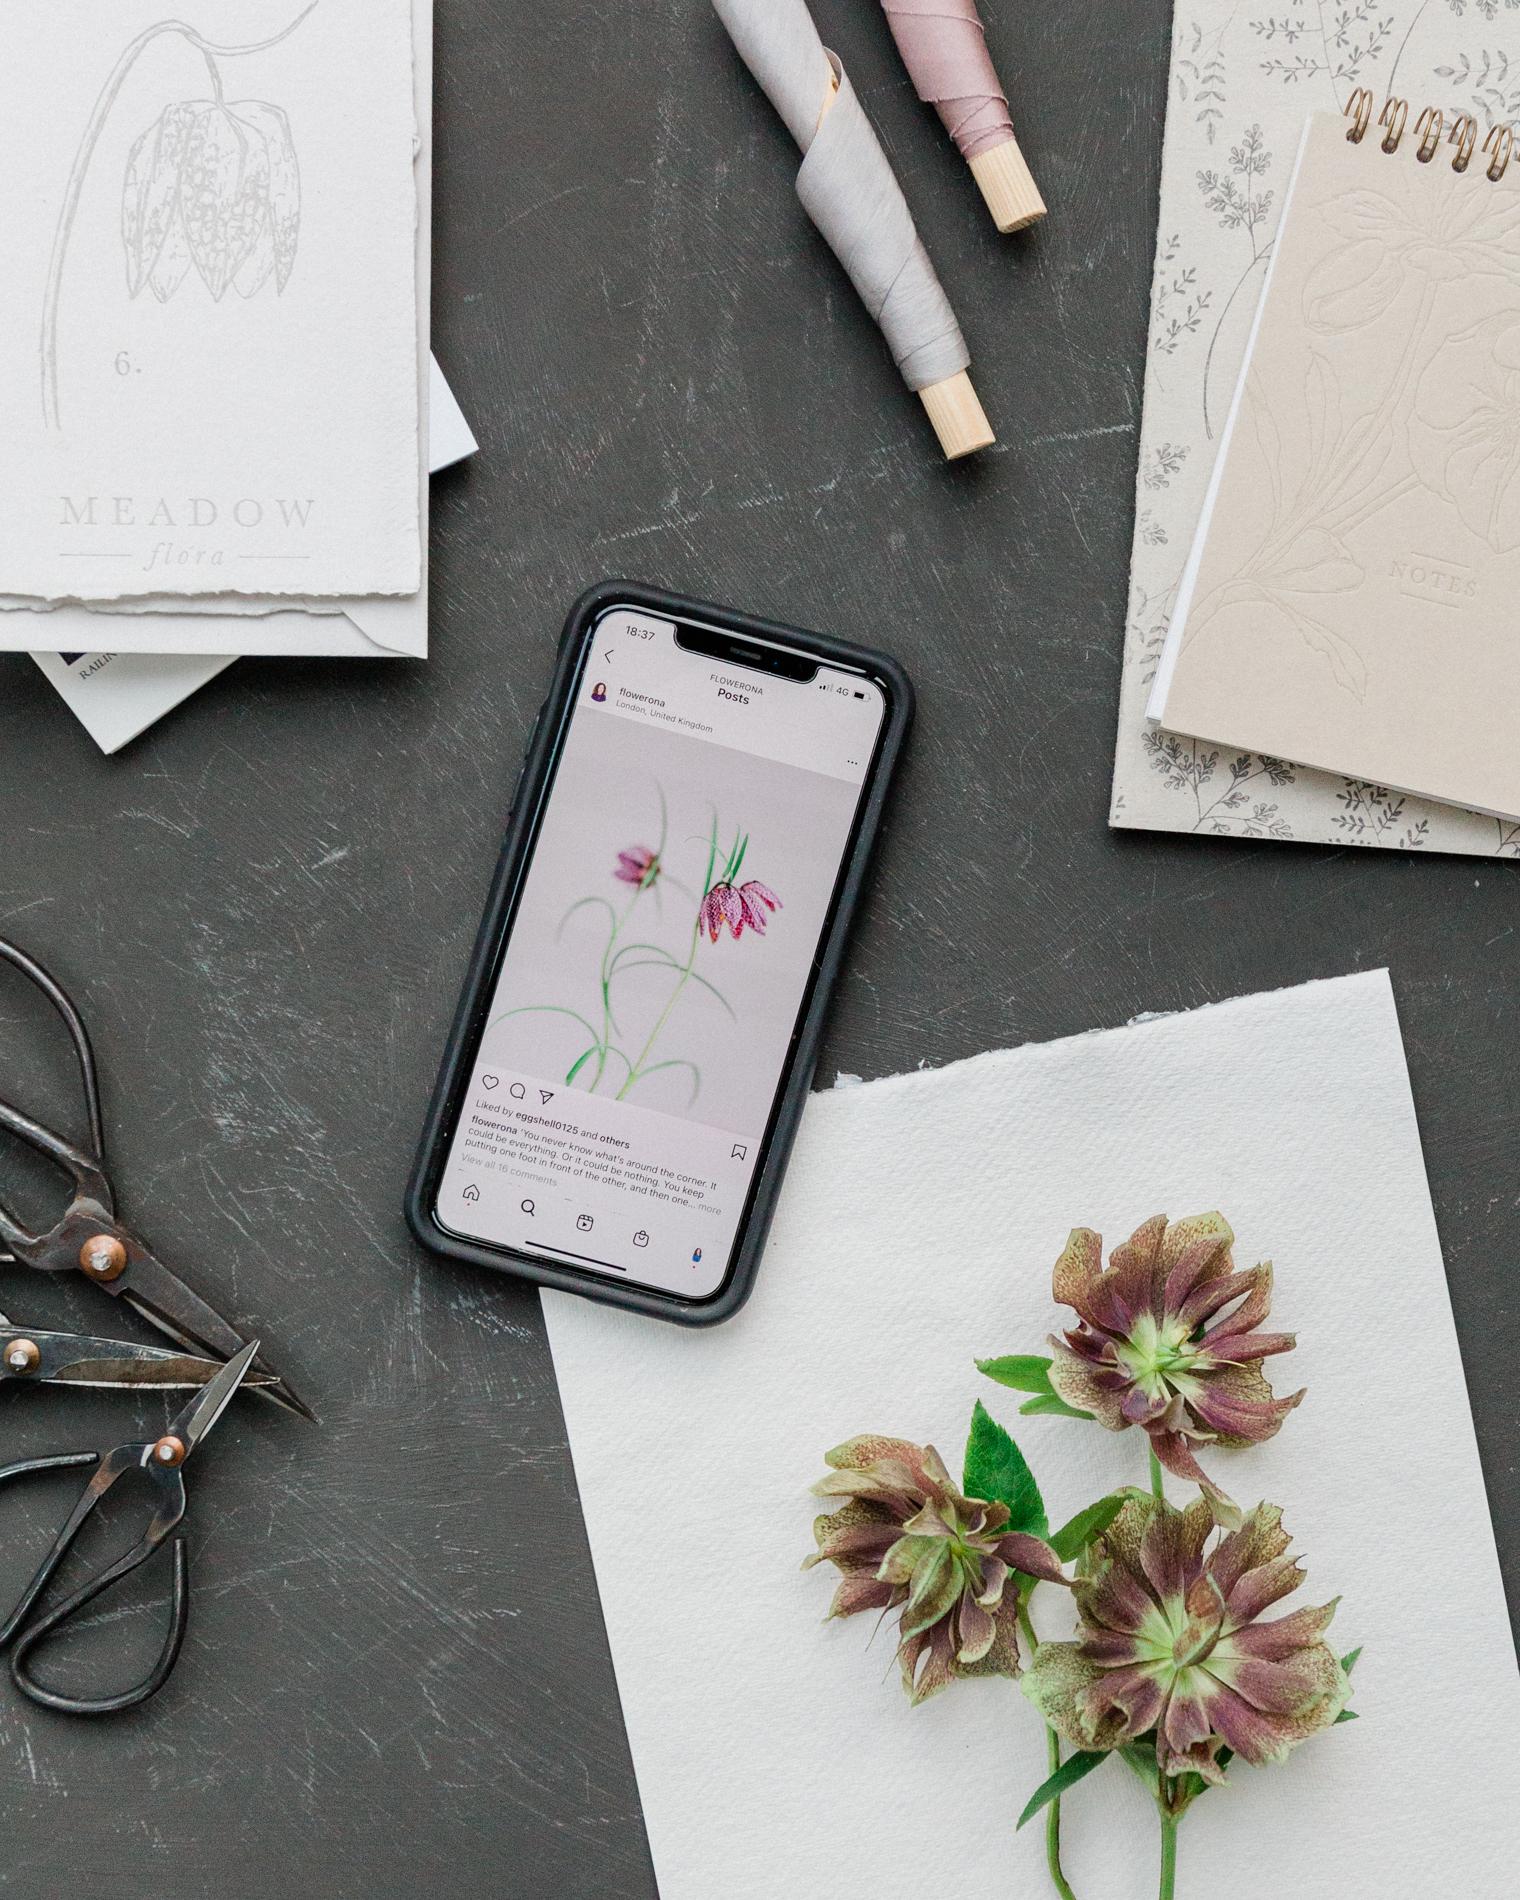 Instagram Tips for Florists | Instagram for Florists Online Course